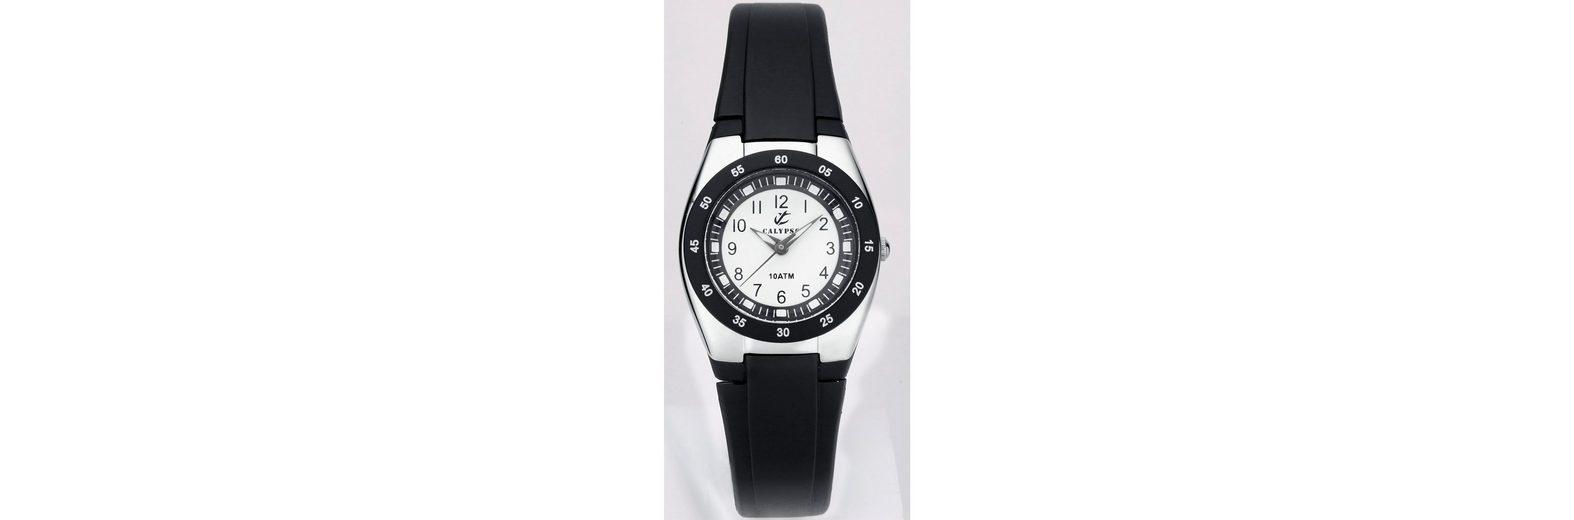 "CALYPSO WATCHES, Armbanduhr, ""K6043/F"""